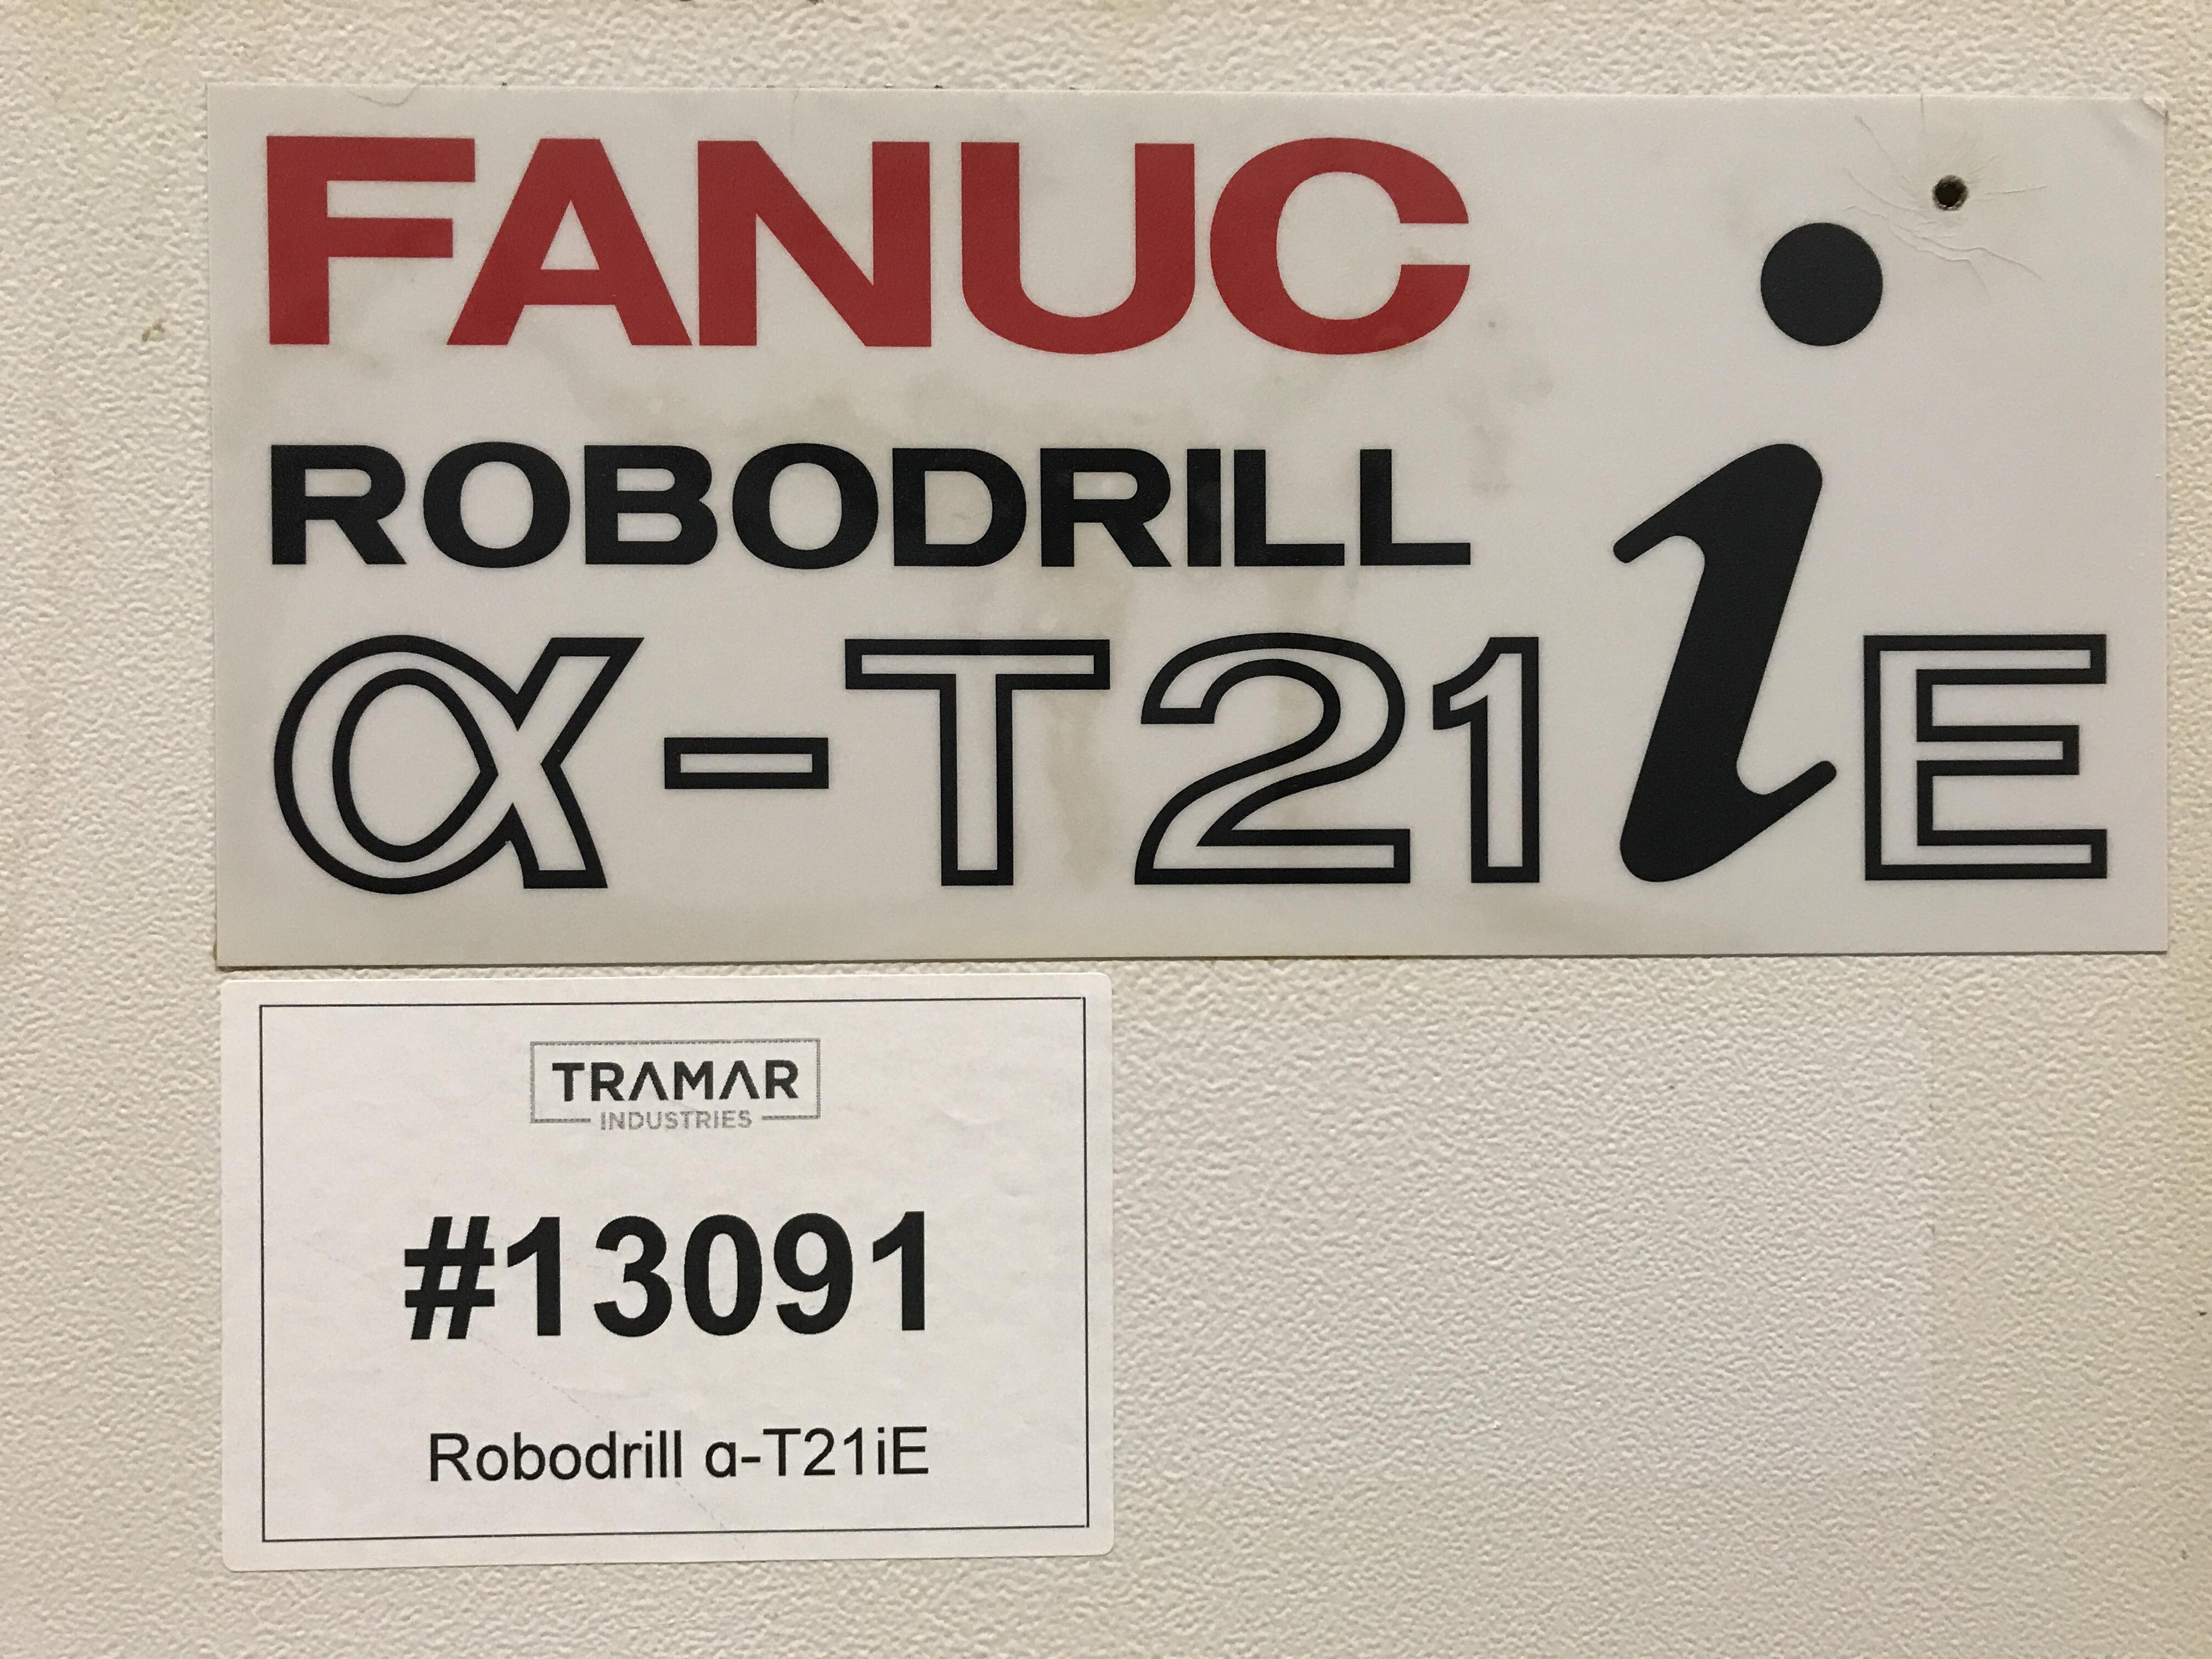 2005 FANUC Robodrill a-T21iE - 5 Axis - Vertical Machining Center